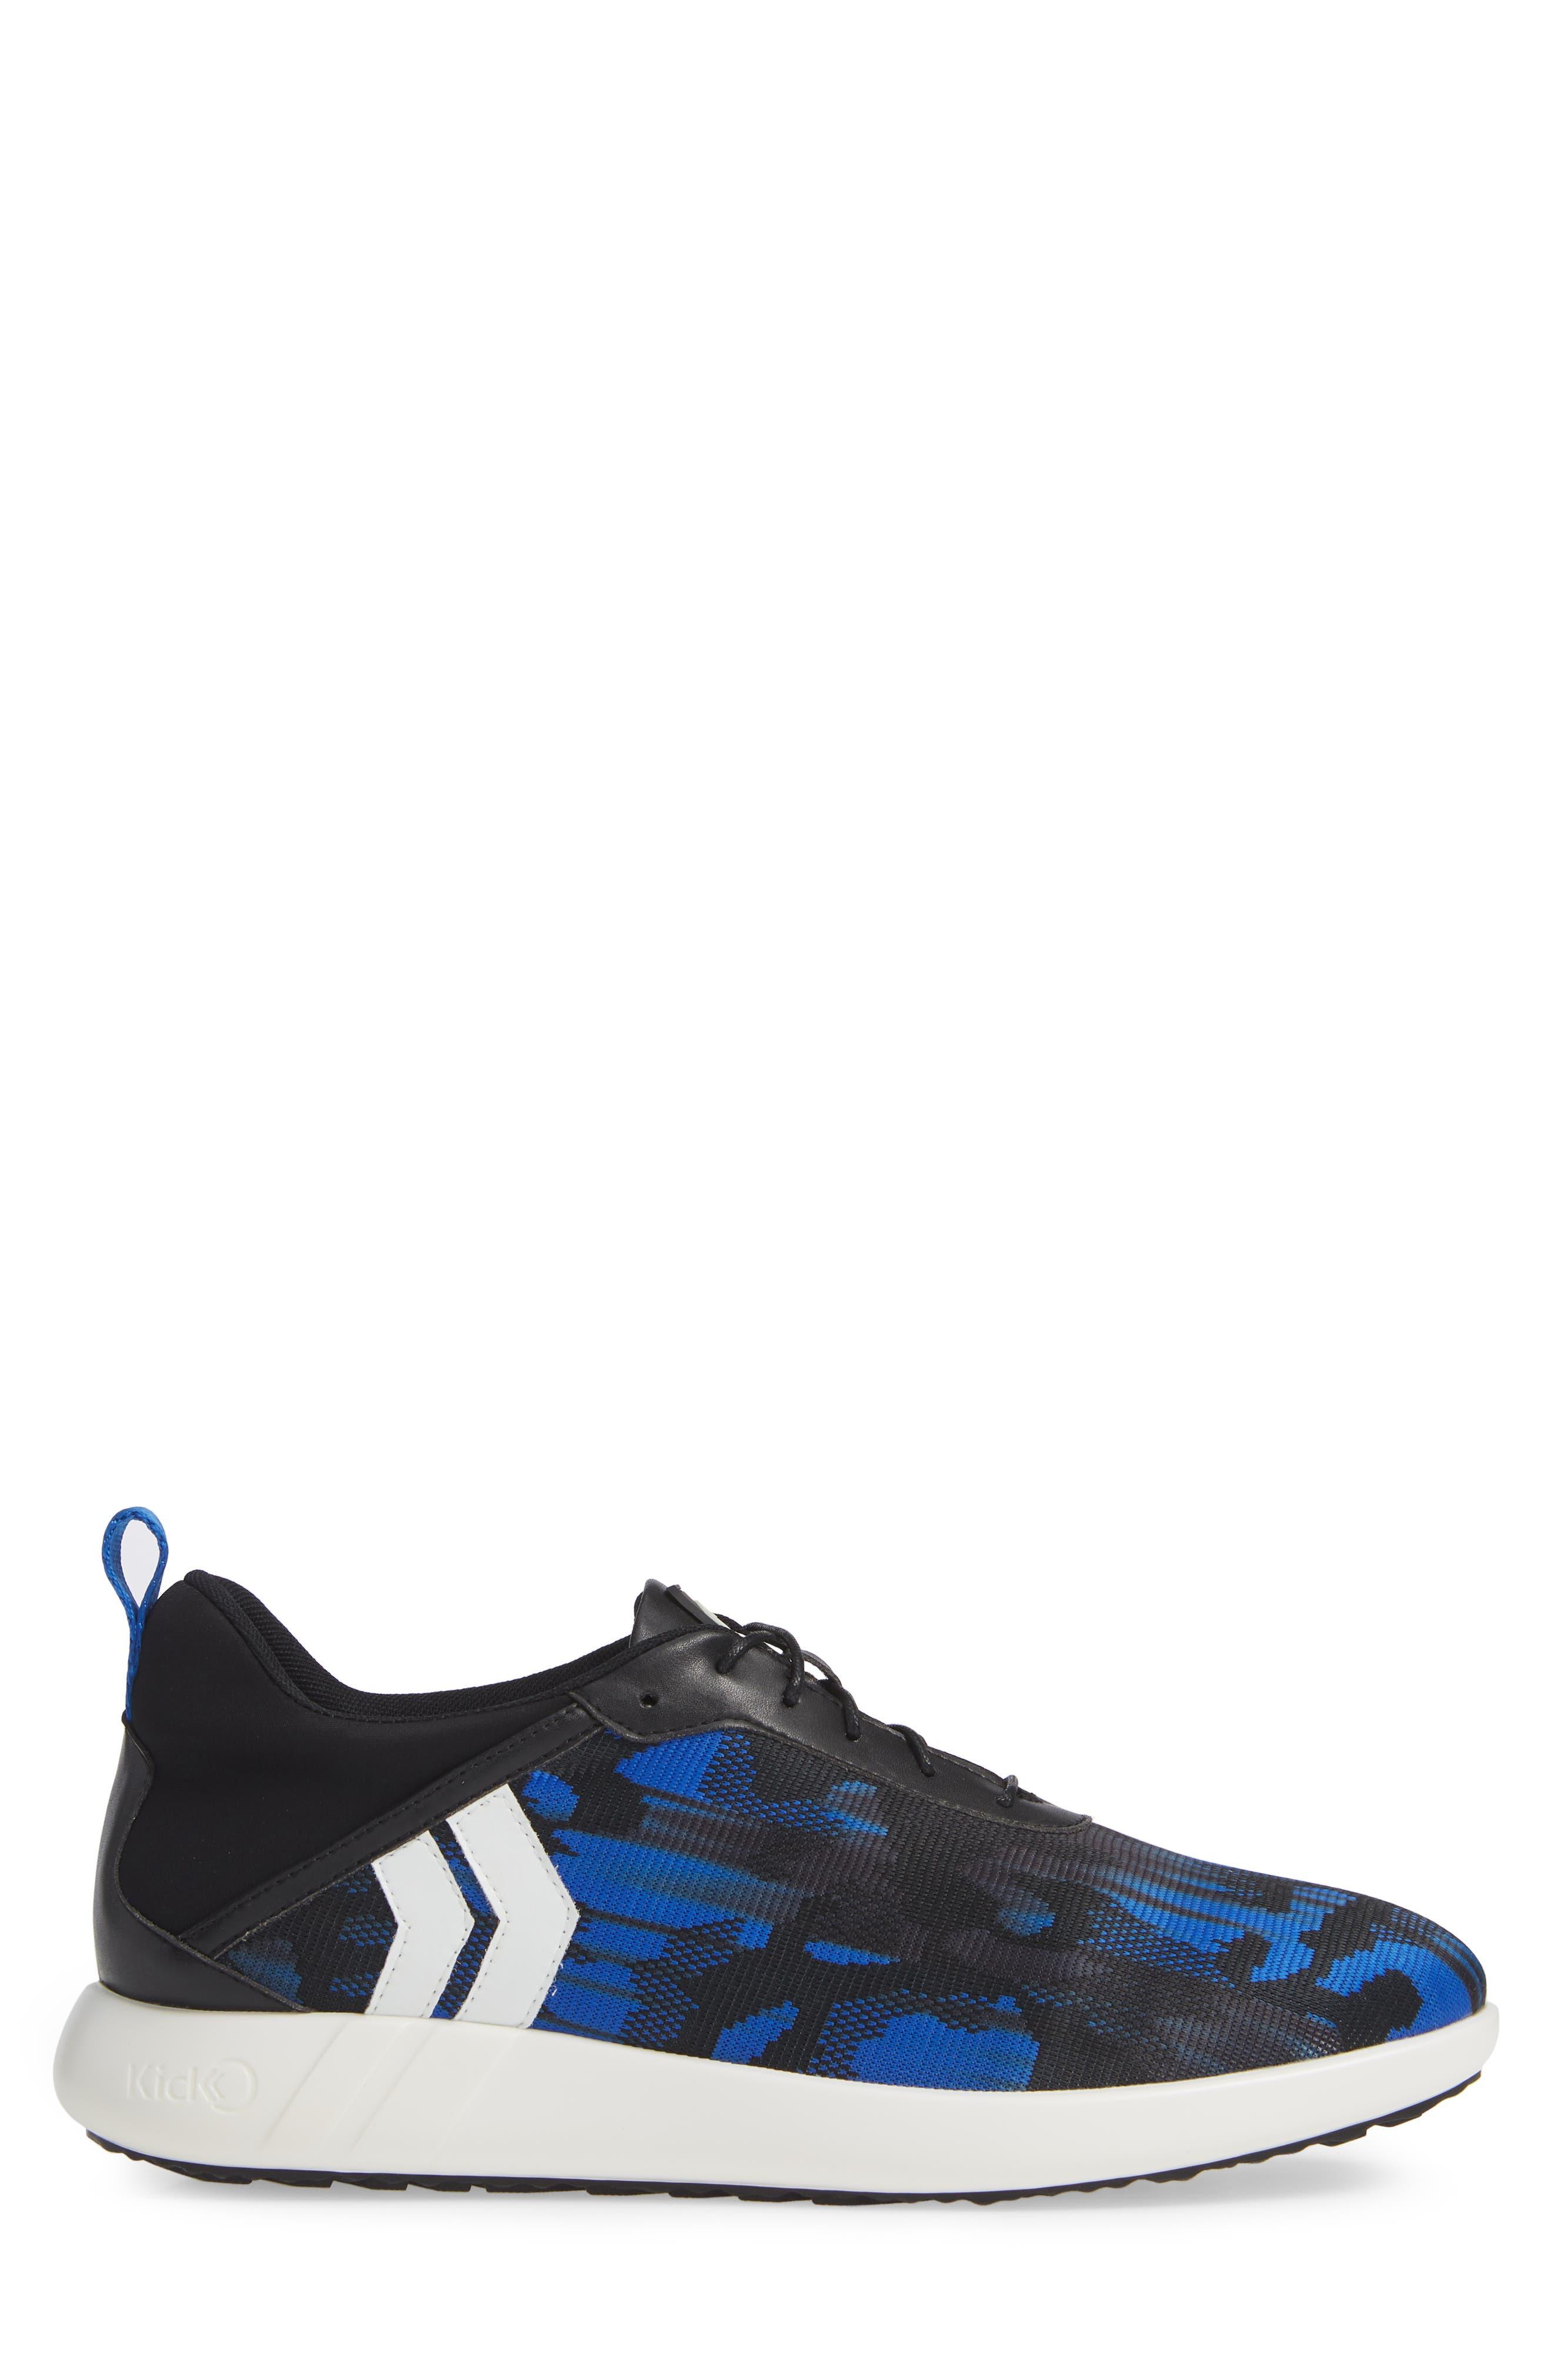 Ghost Sneaker,                             Alternate thumbnail 3, color,                             430